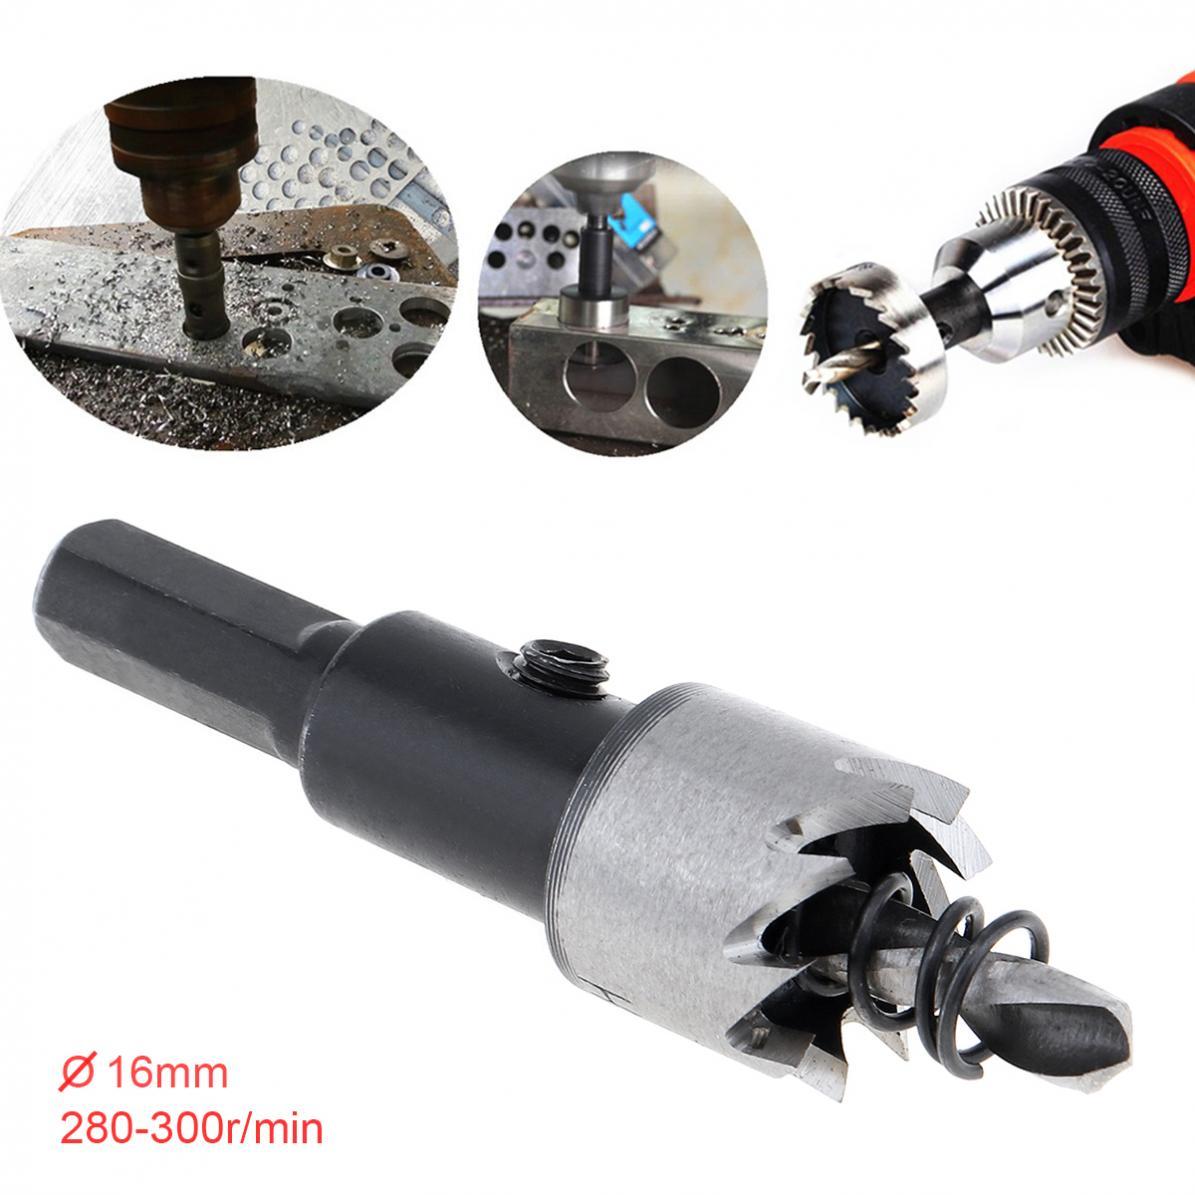 16mm HSS Drill Bit Hole Saw Twist Drill Bits Cutter Power Tool Metal Holes Drilling Kit Carpentry Tools For Wood Steel Iron